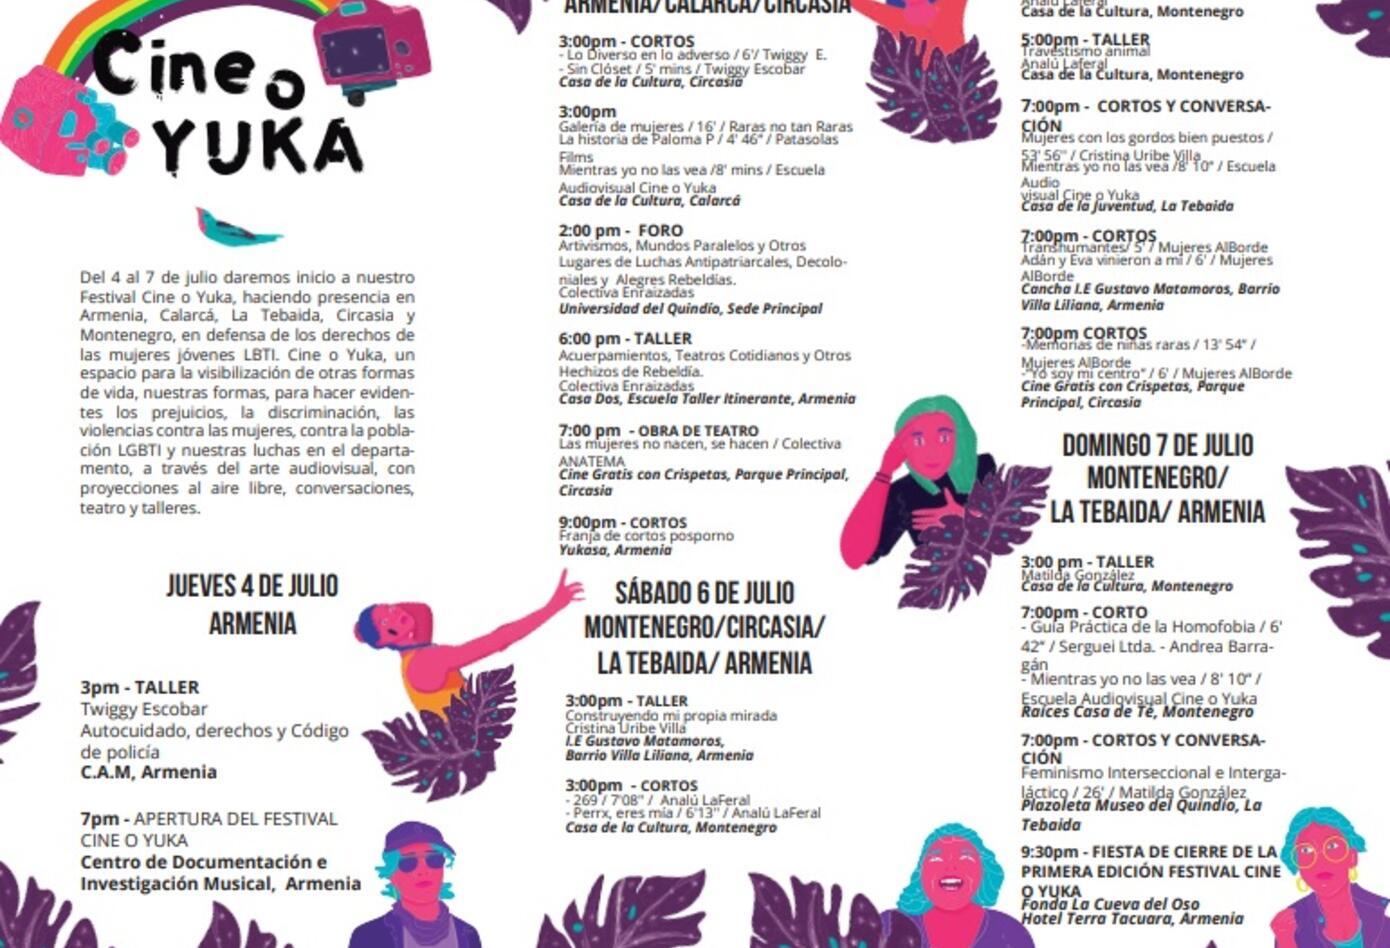 Colectivo Feminista Yukasa - Armenia